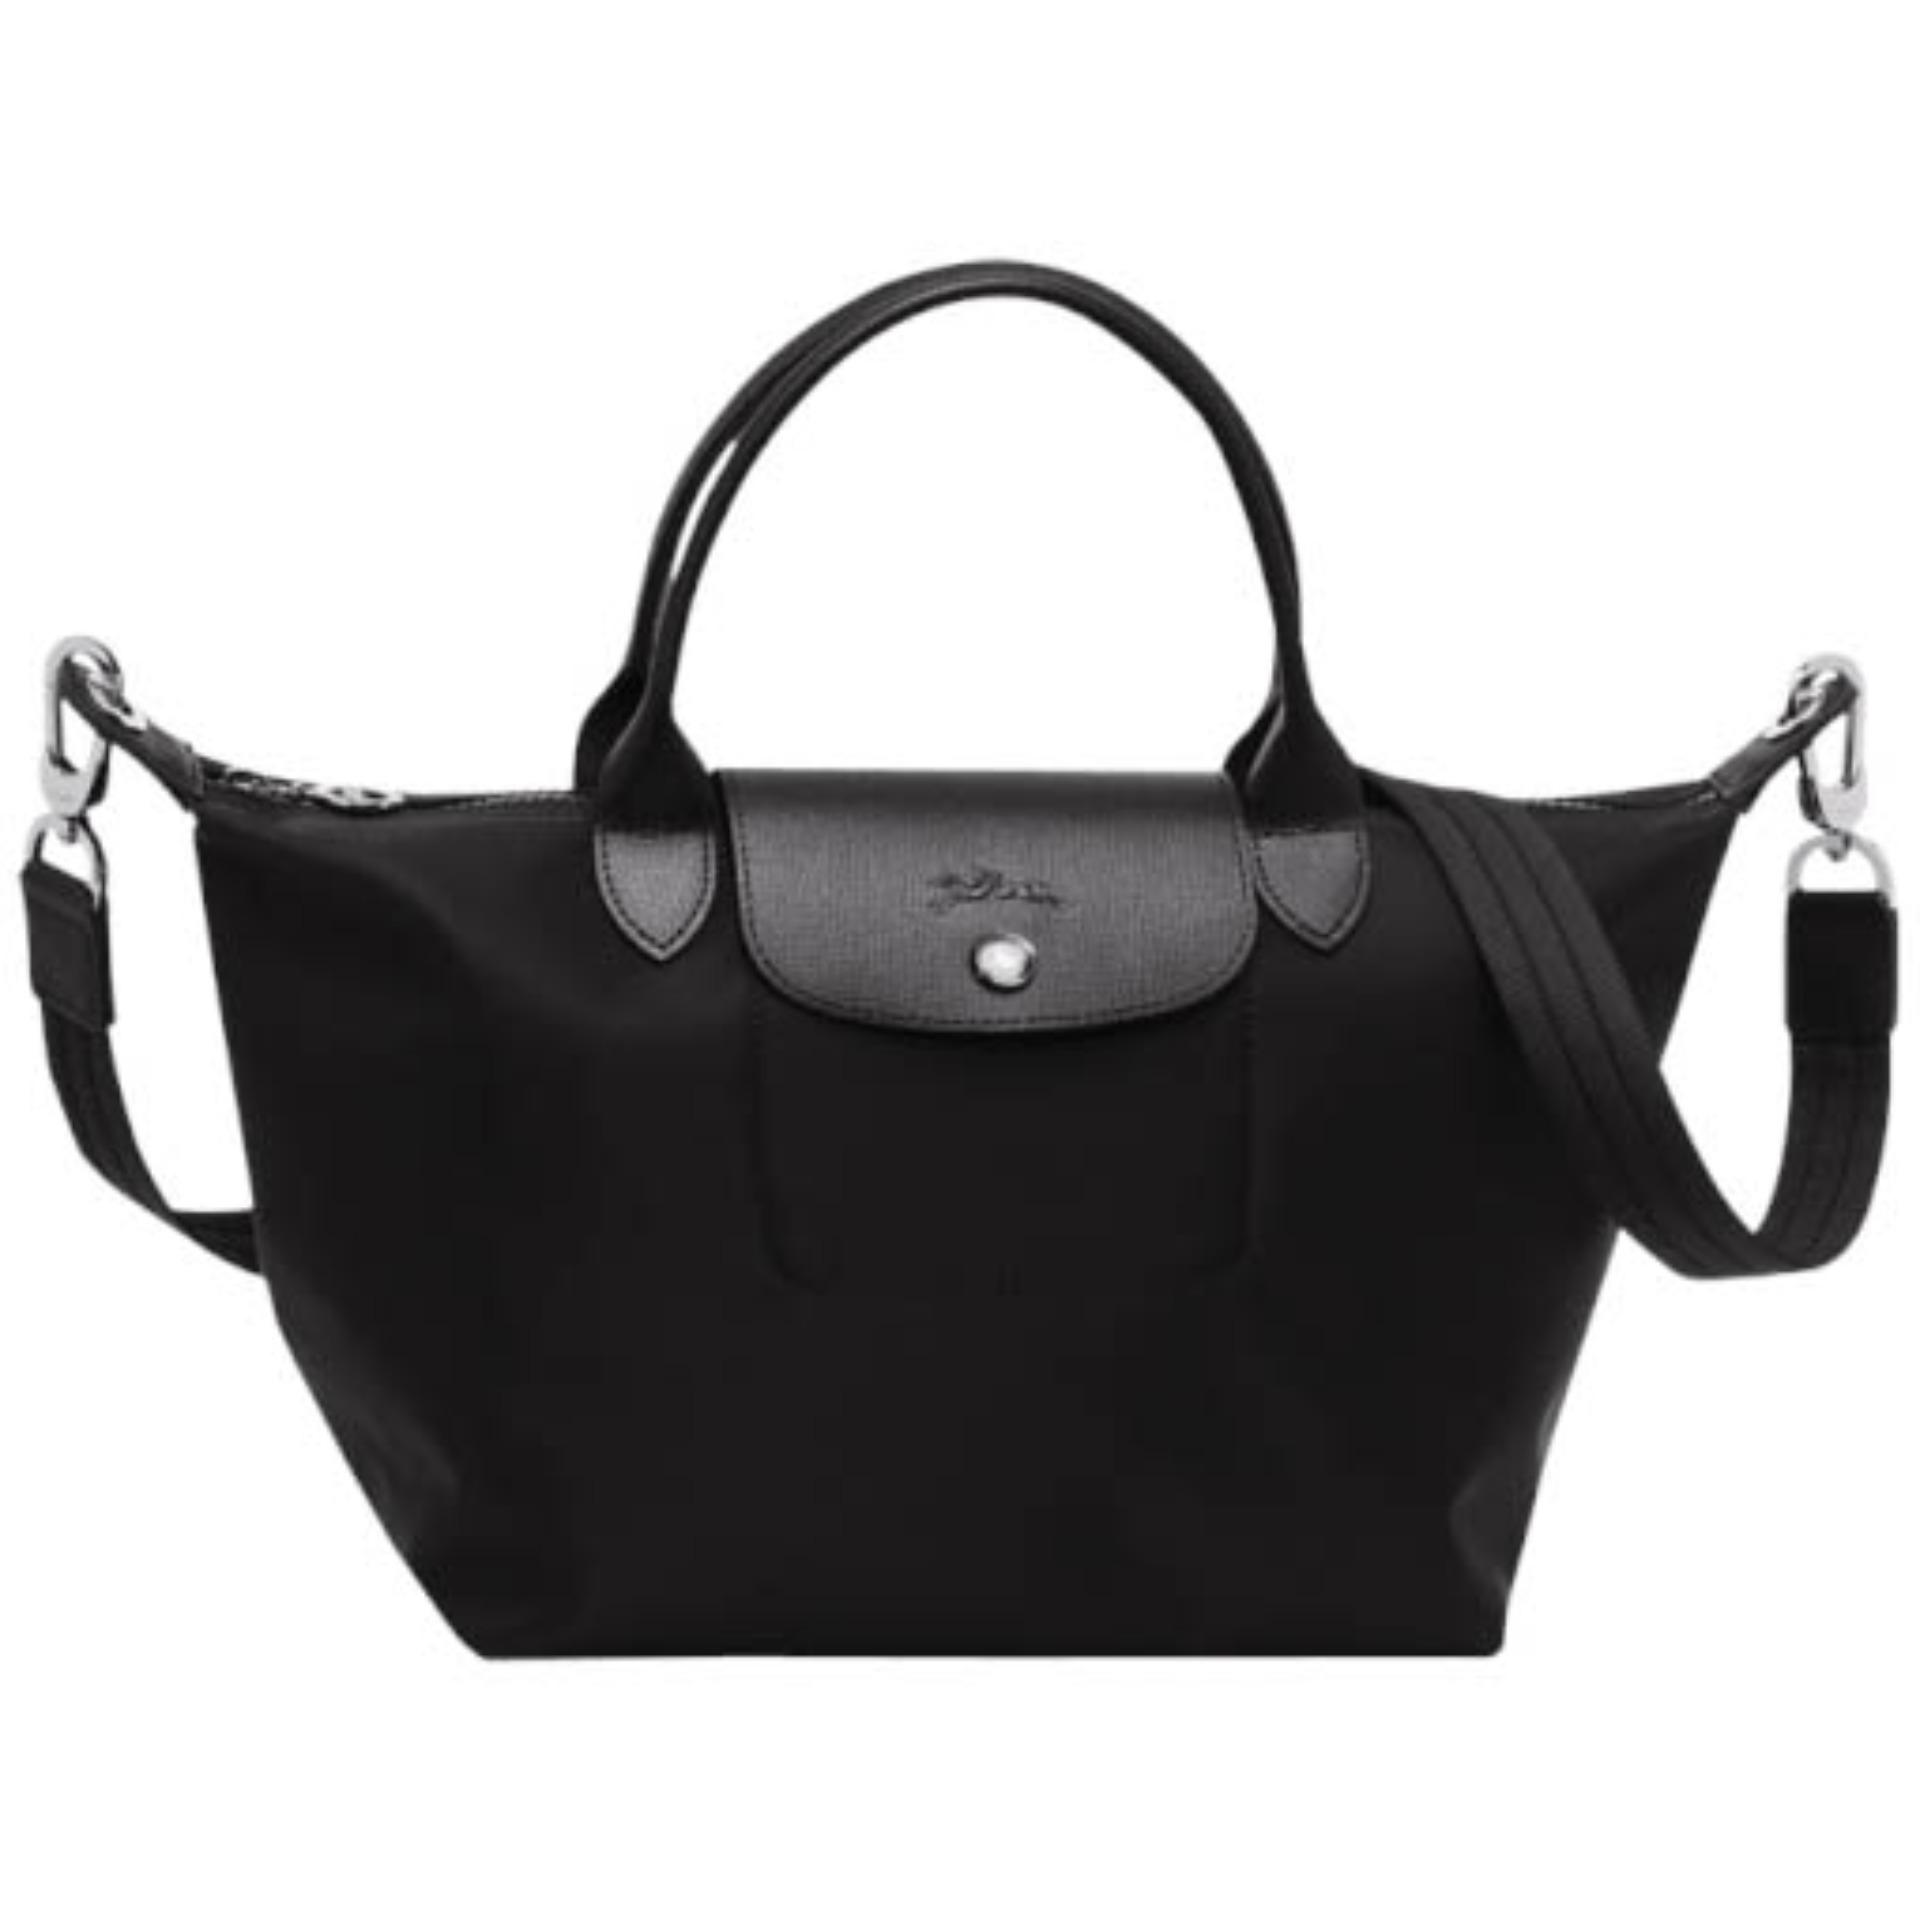 Longchamp Le Pliage Neo Small Handbag (Black) | Lazada PH